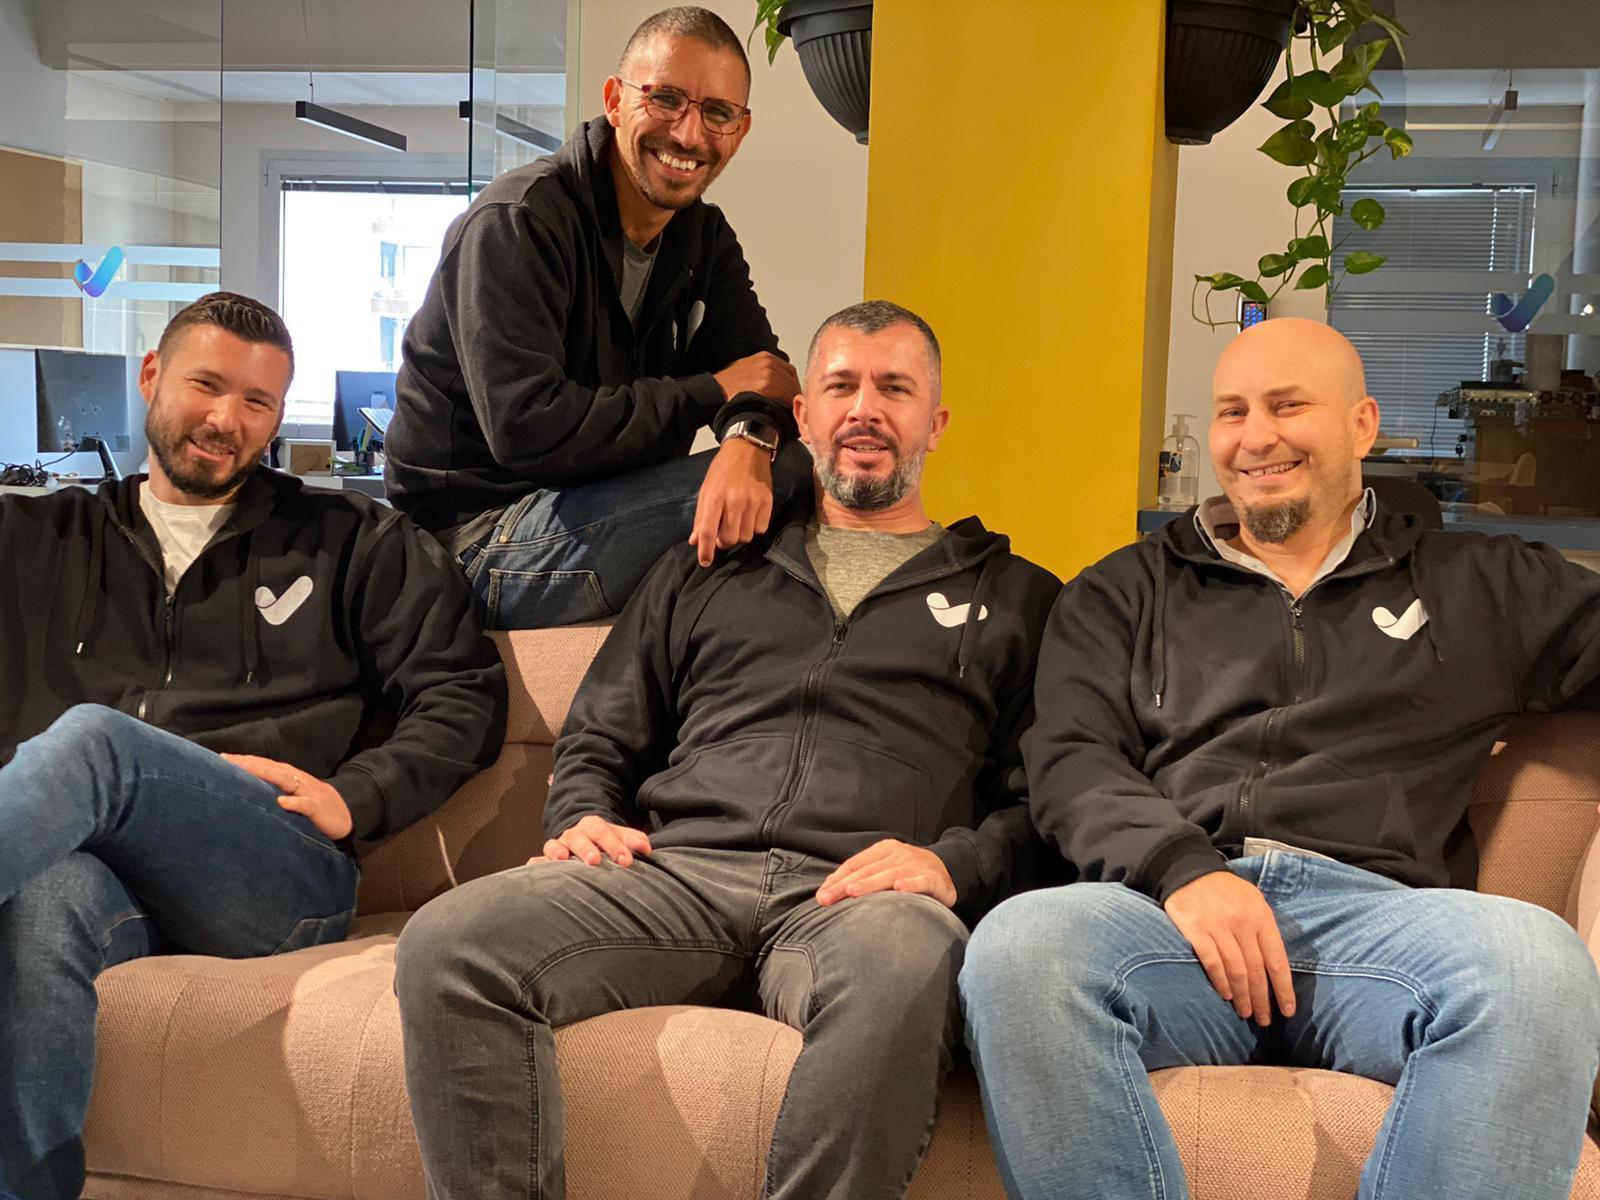 Lightico Secures $13m to Consumerize Legacy eSign and Streamline B2C Digital Customer Journeys